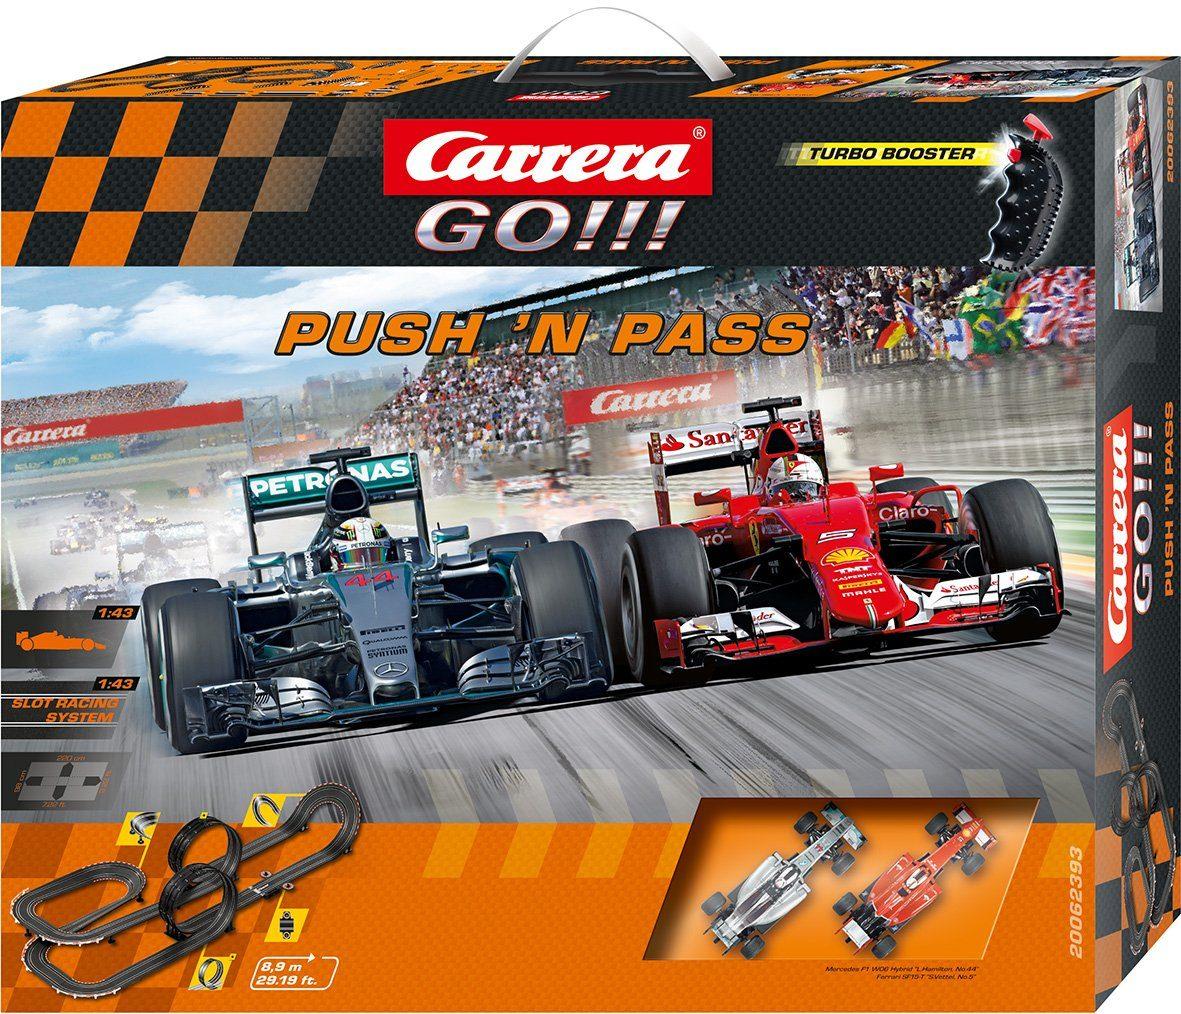 Carrera Autorennbahn, »Carrera® GO!!! Push 'n pass«